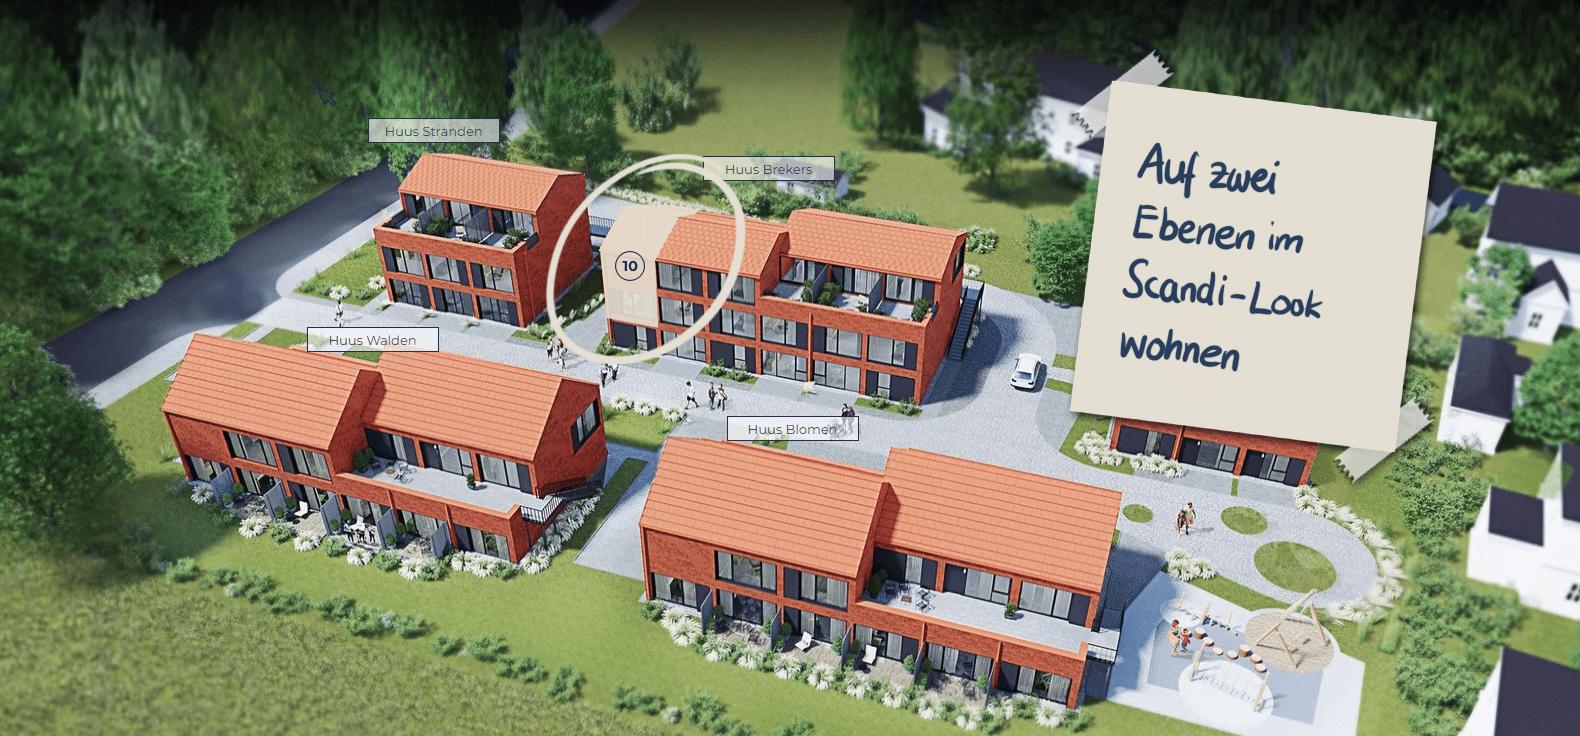 10_De ole School - Ostseeurlaub Ferienapartments Hohwacht Nähe Heiligenhafen Lütjenburg Kieler Bucht